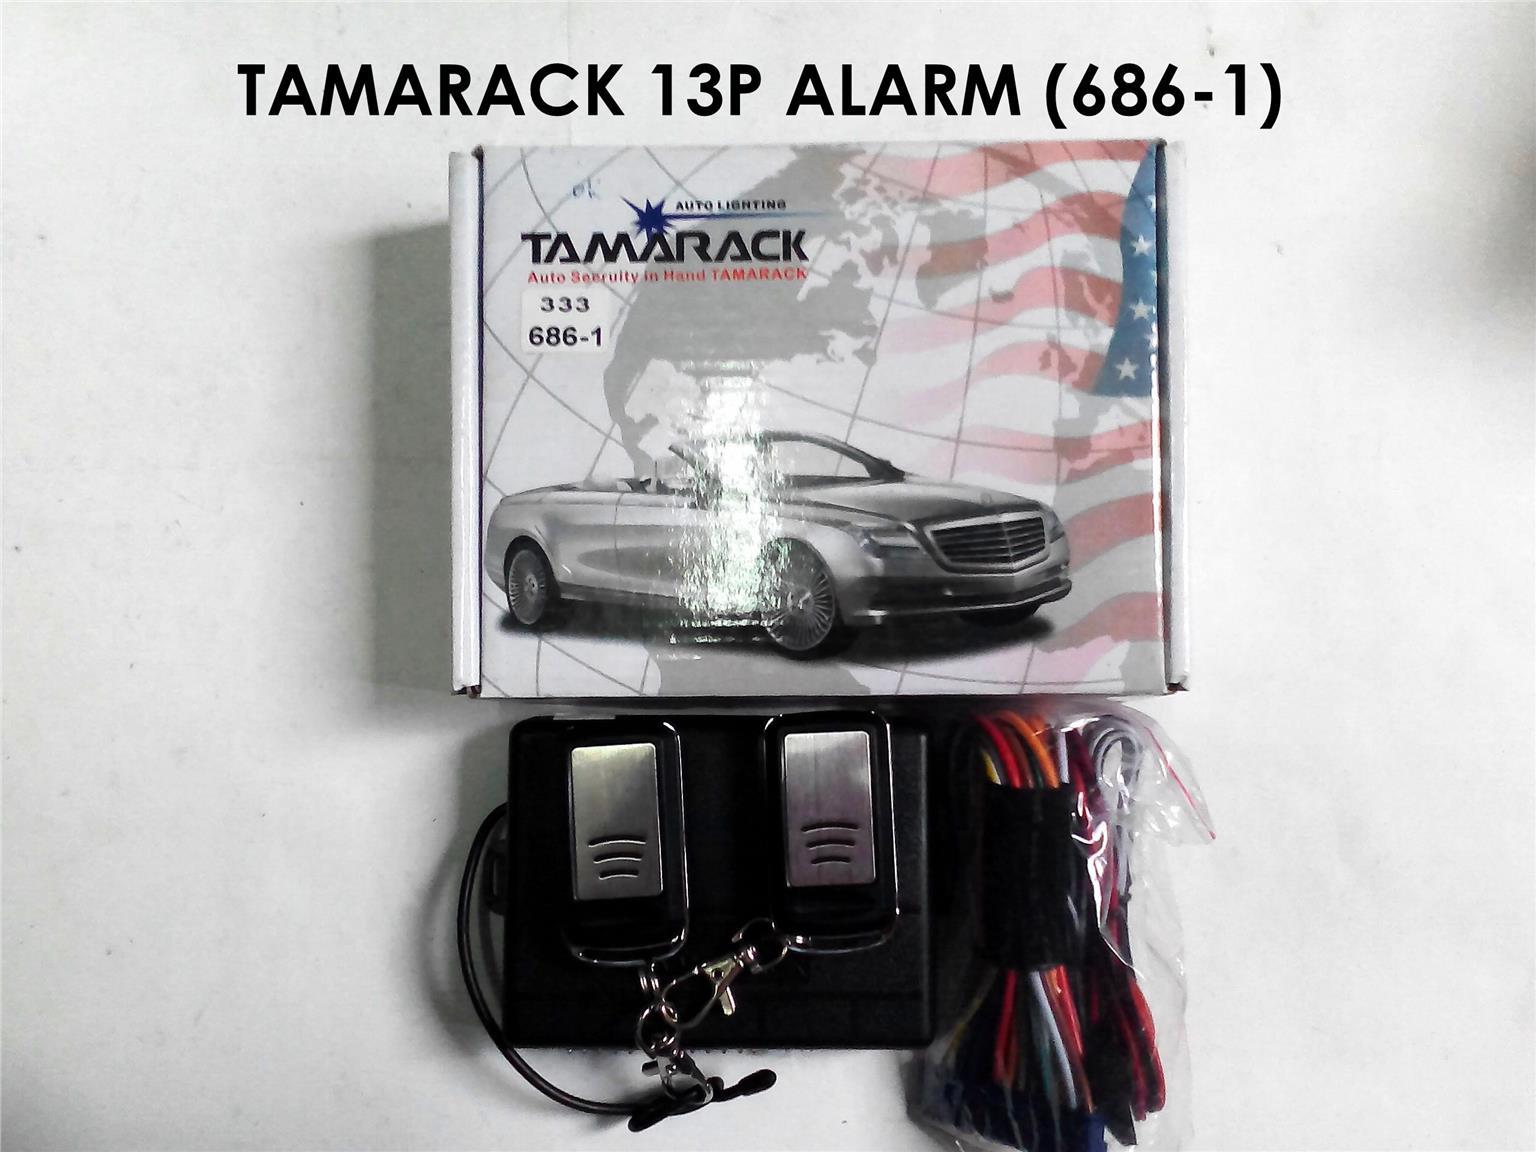 Tamarack Car Alarm Wiring Diagram Schematics And Diagrams Central Locking For Viper